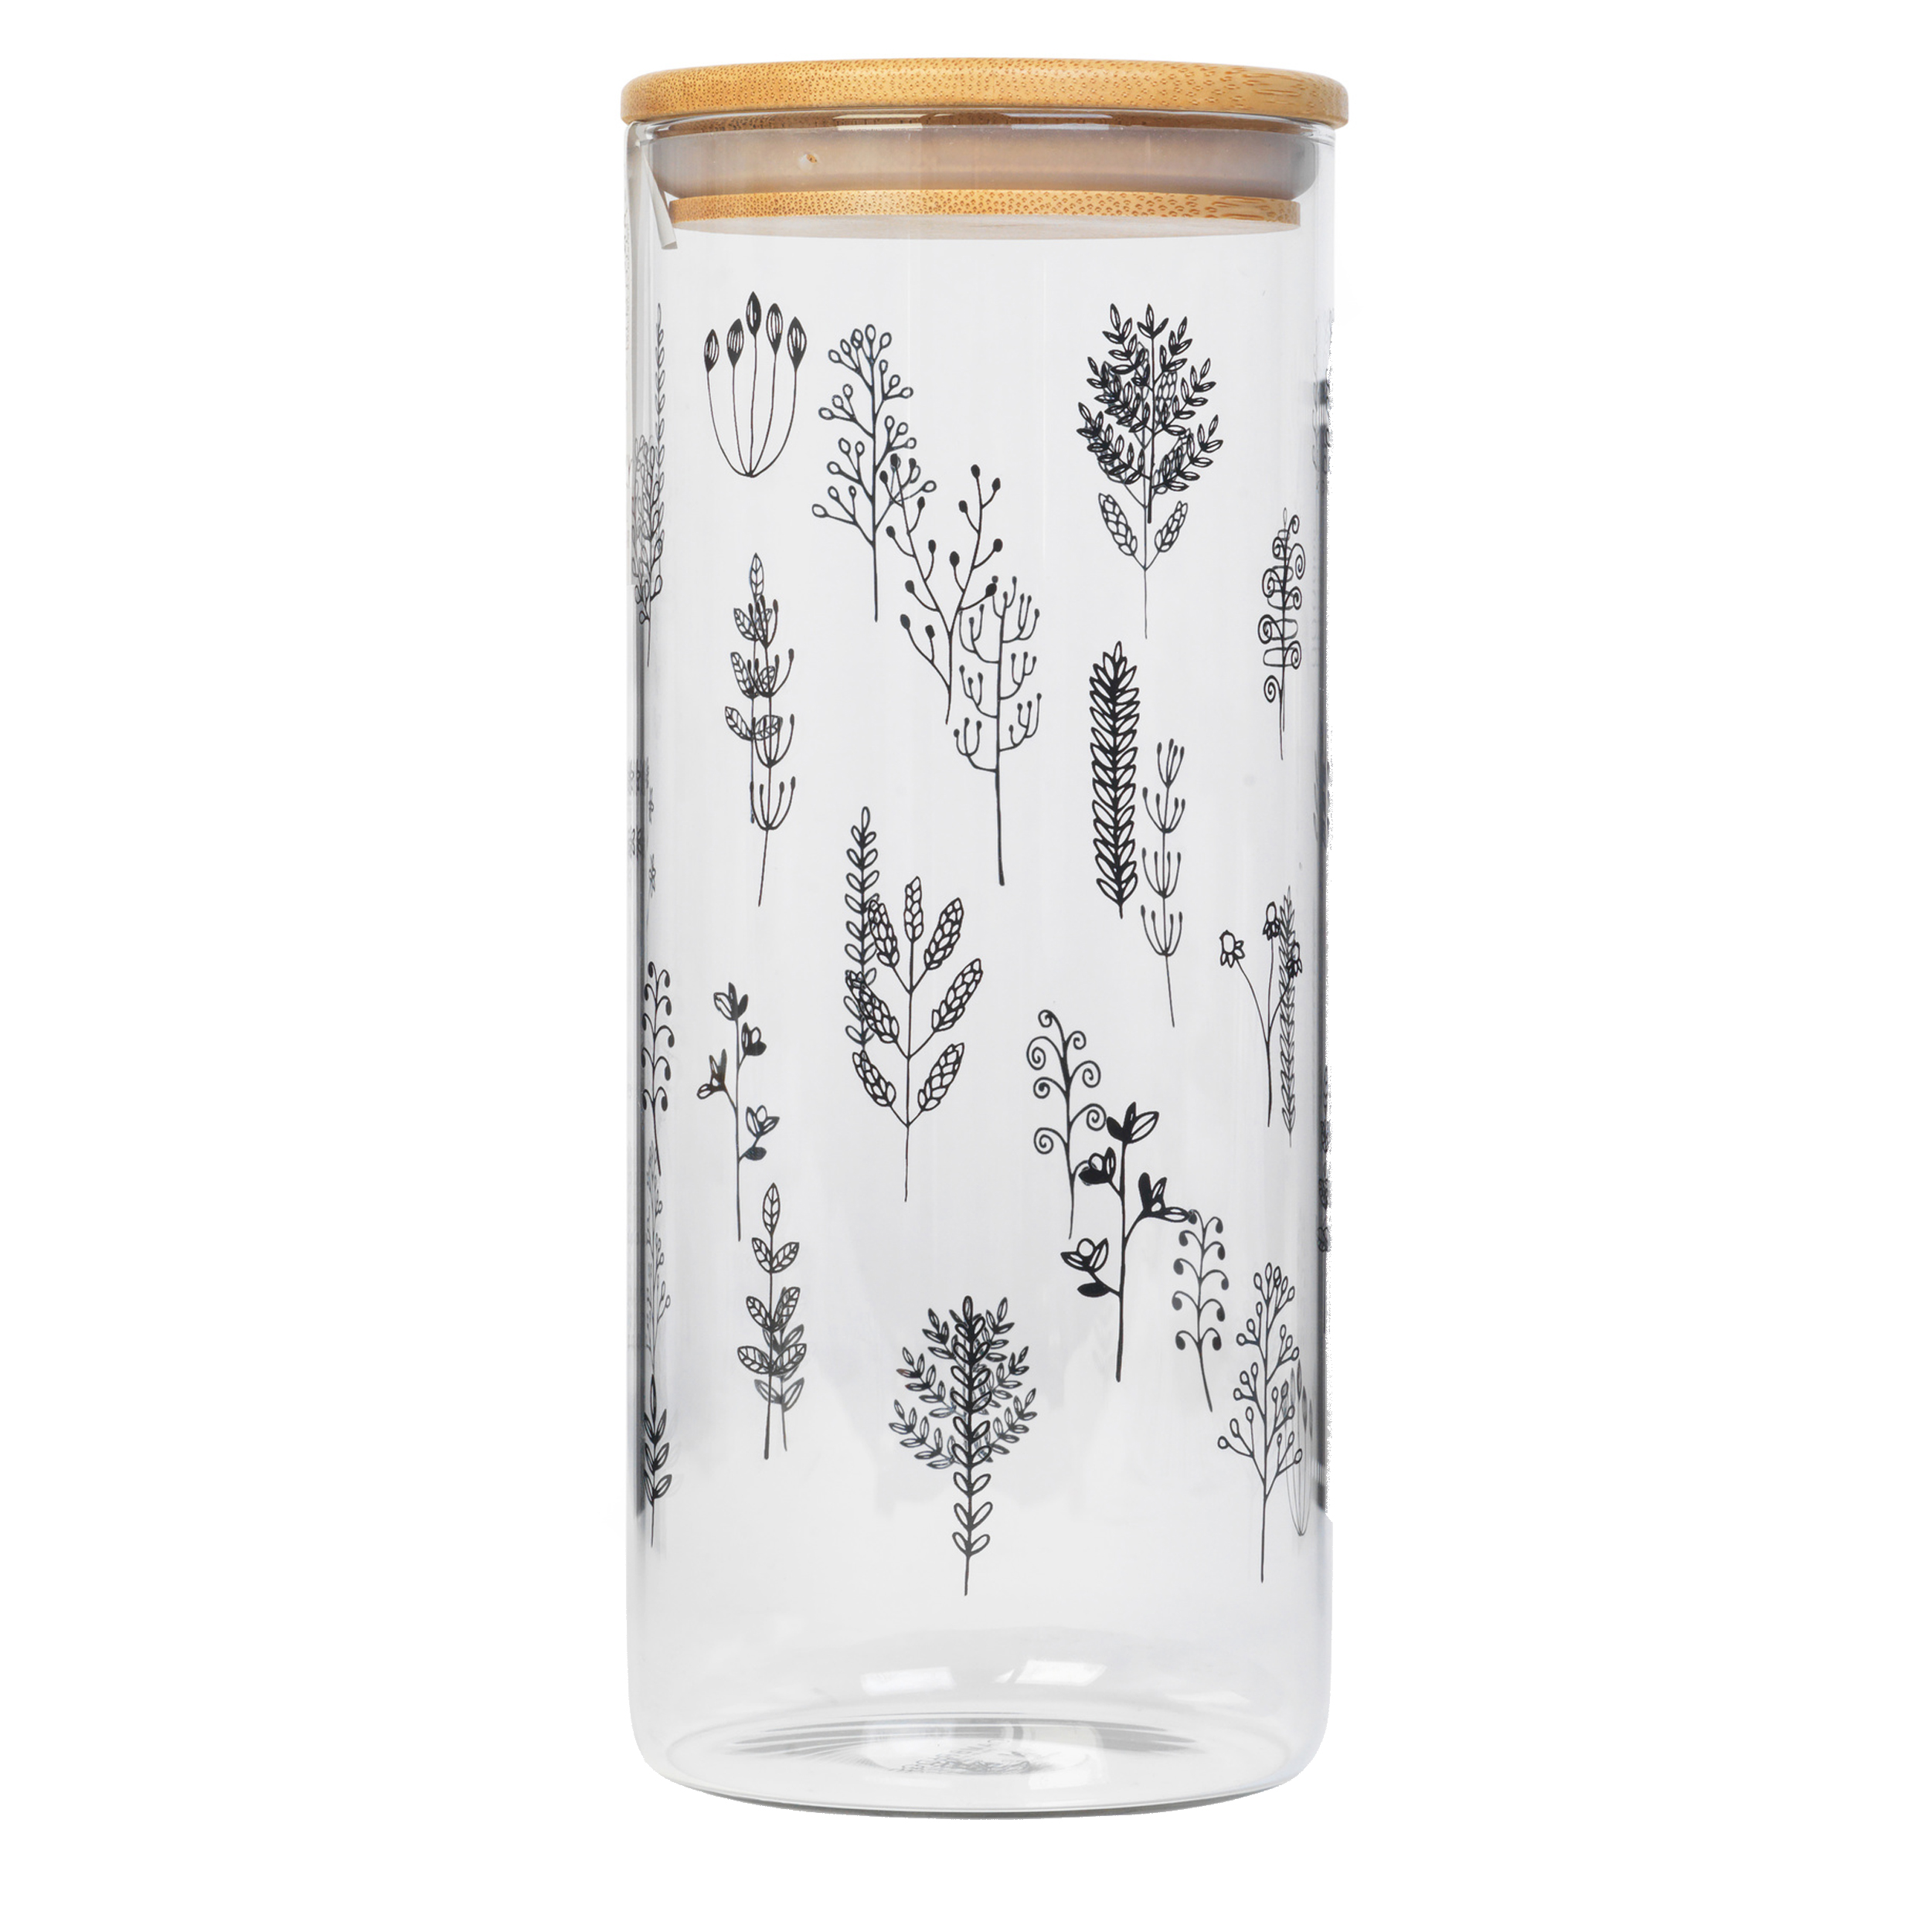 thumbnail 9 - Cambridge® Storage Preserving Glass Jar, 1200 ml, Spring Meadow/Doodle/Arielle